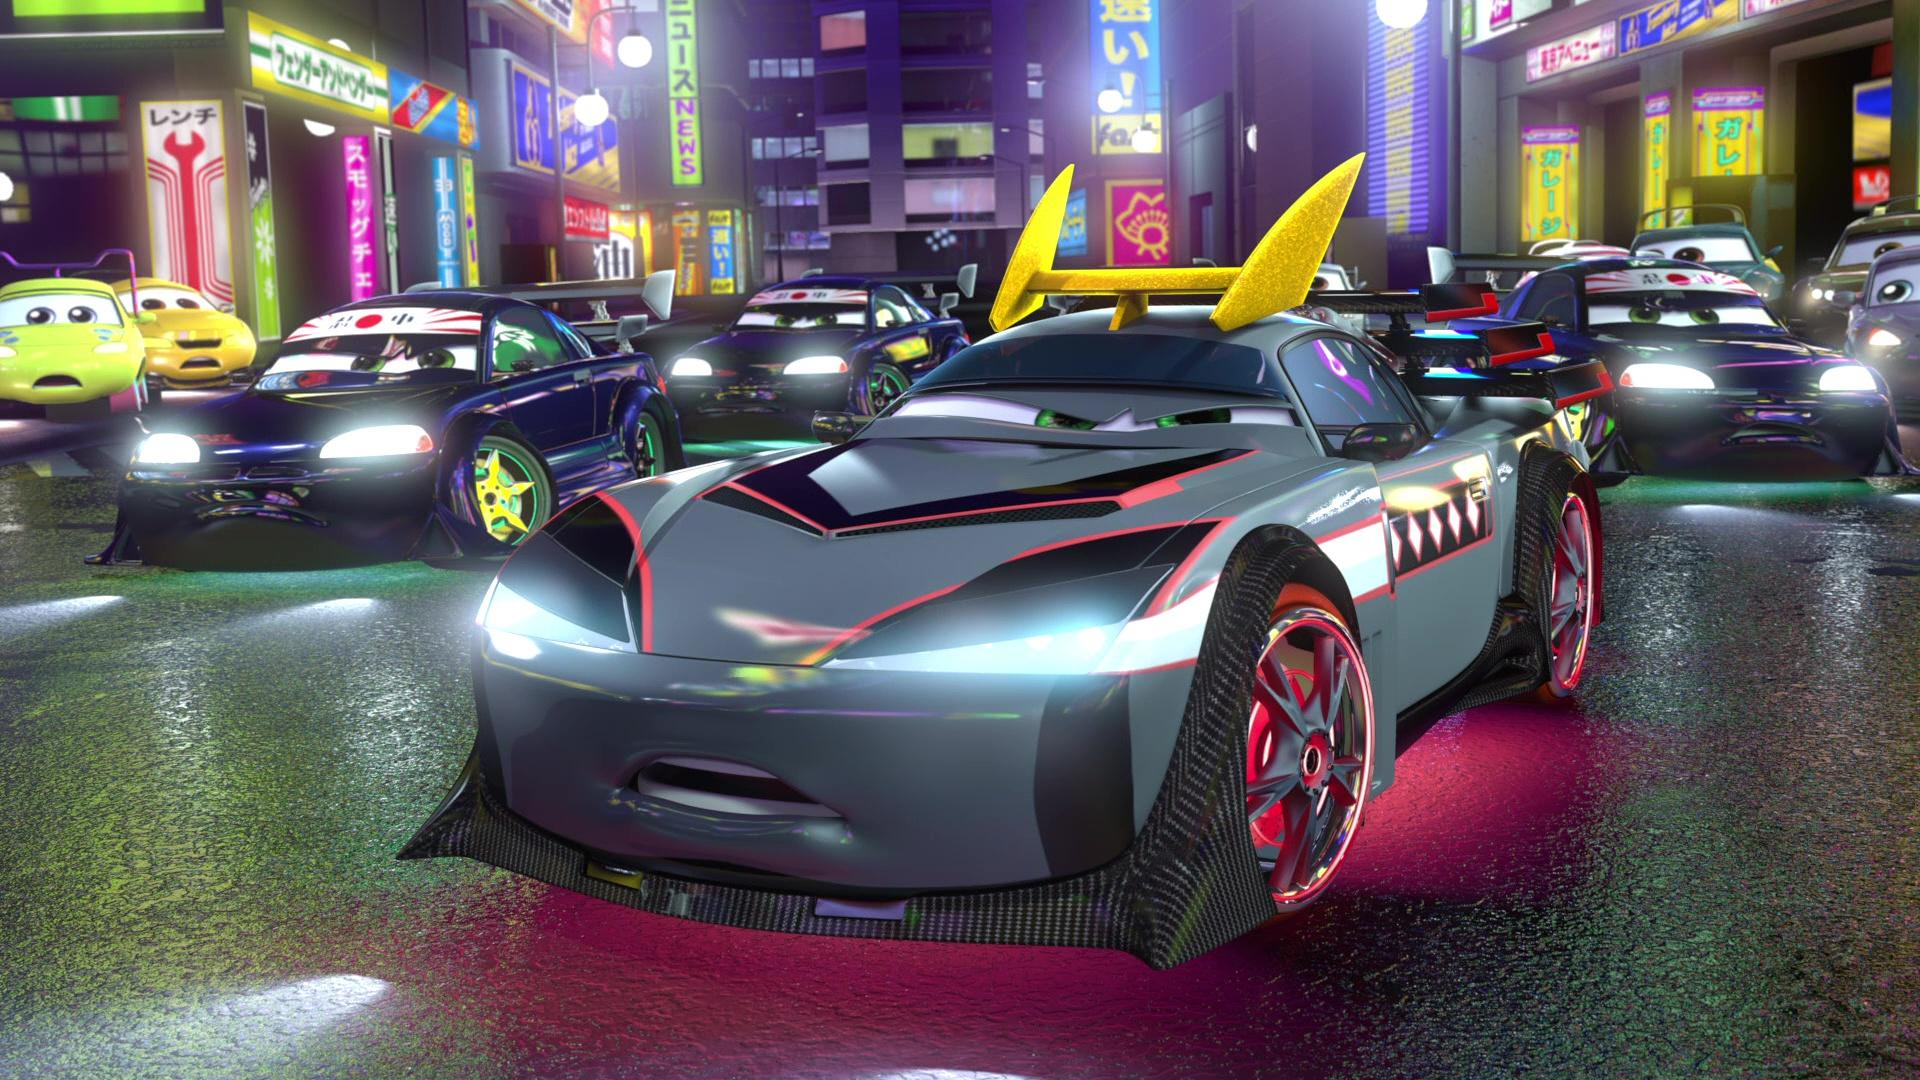 kabuto-cars-toon-tokyo-martin-01